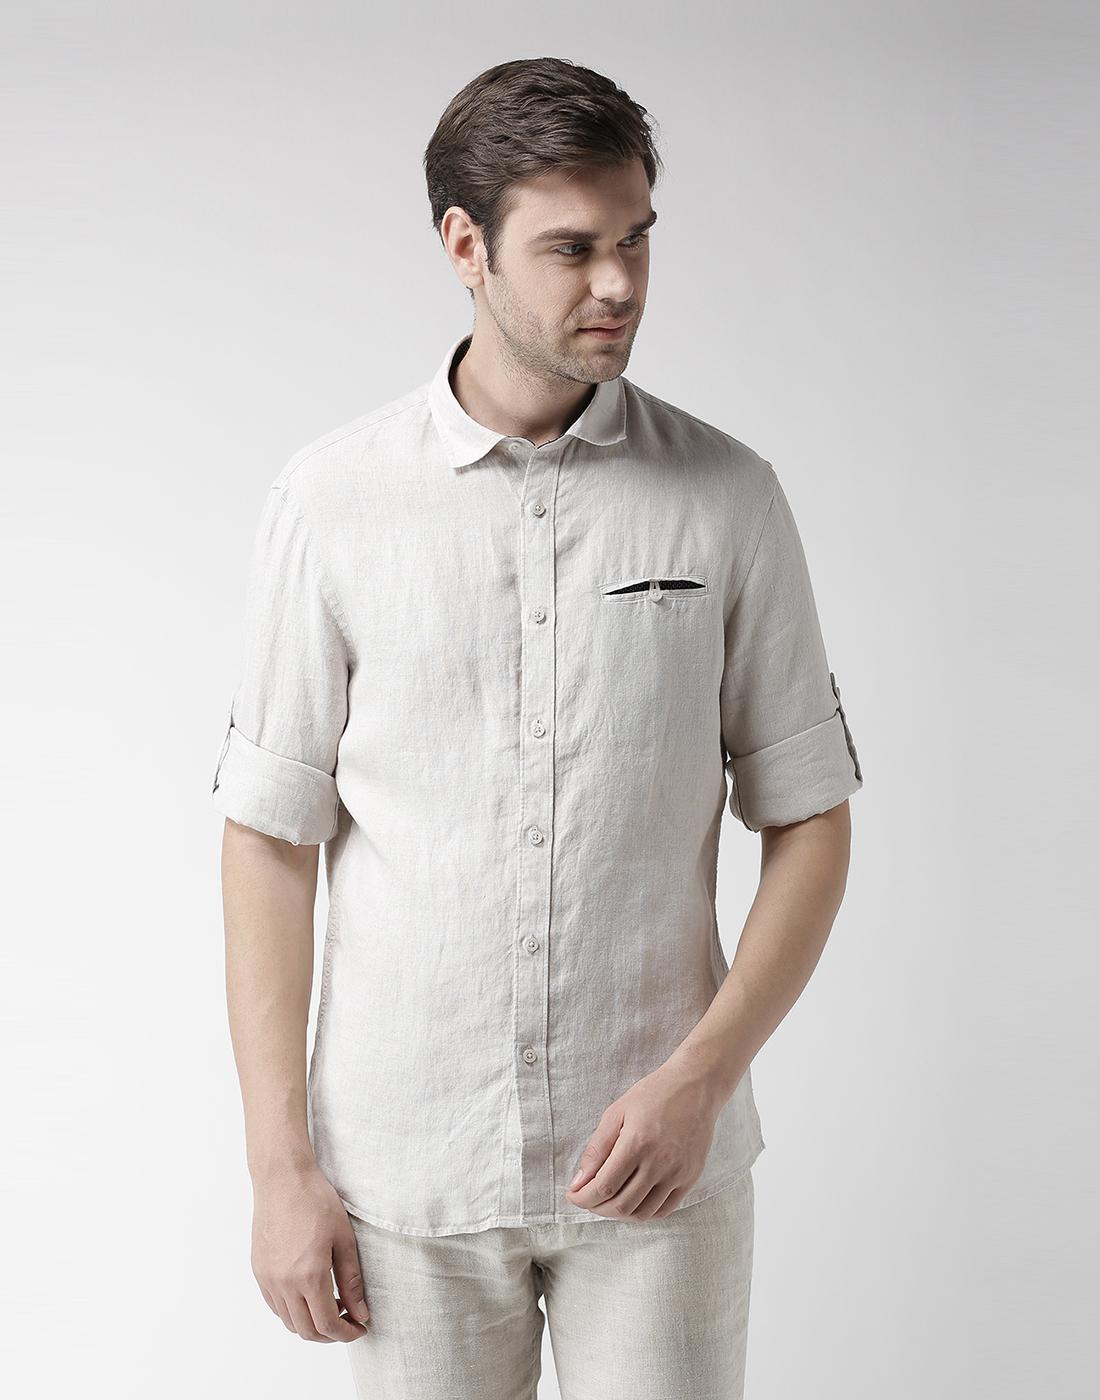 celio |  100% Linen Natural Casual Shirts